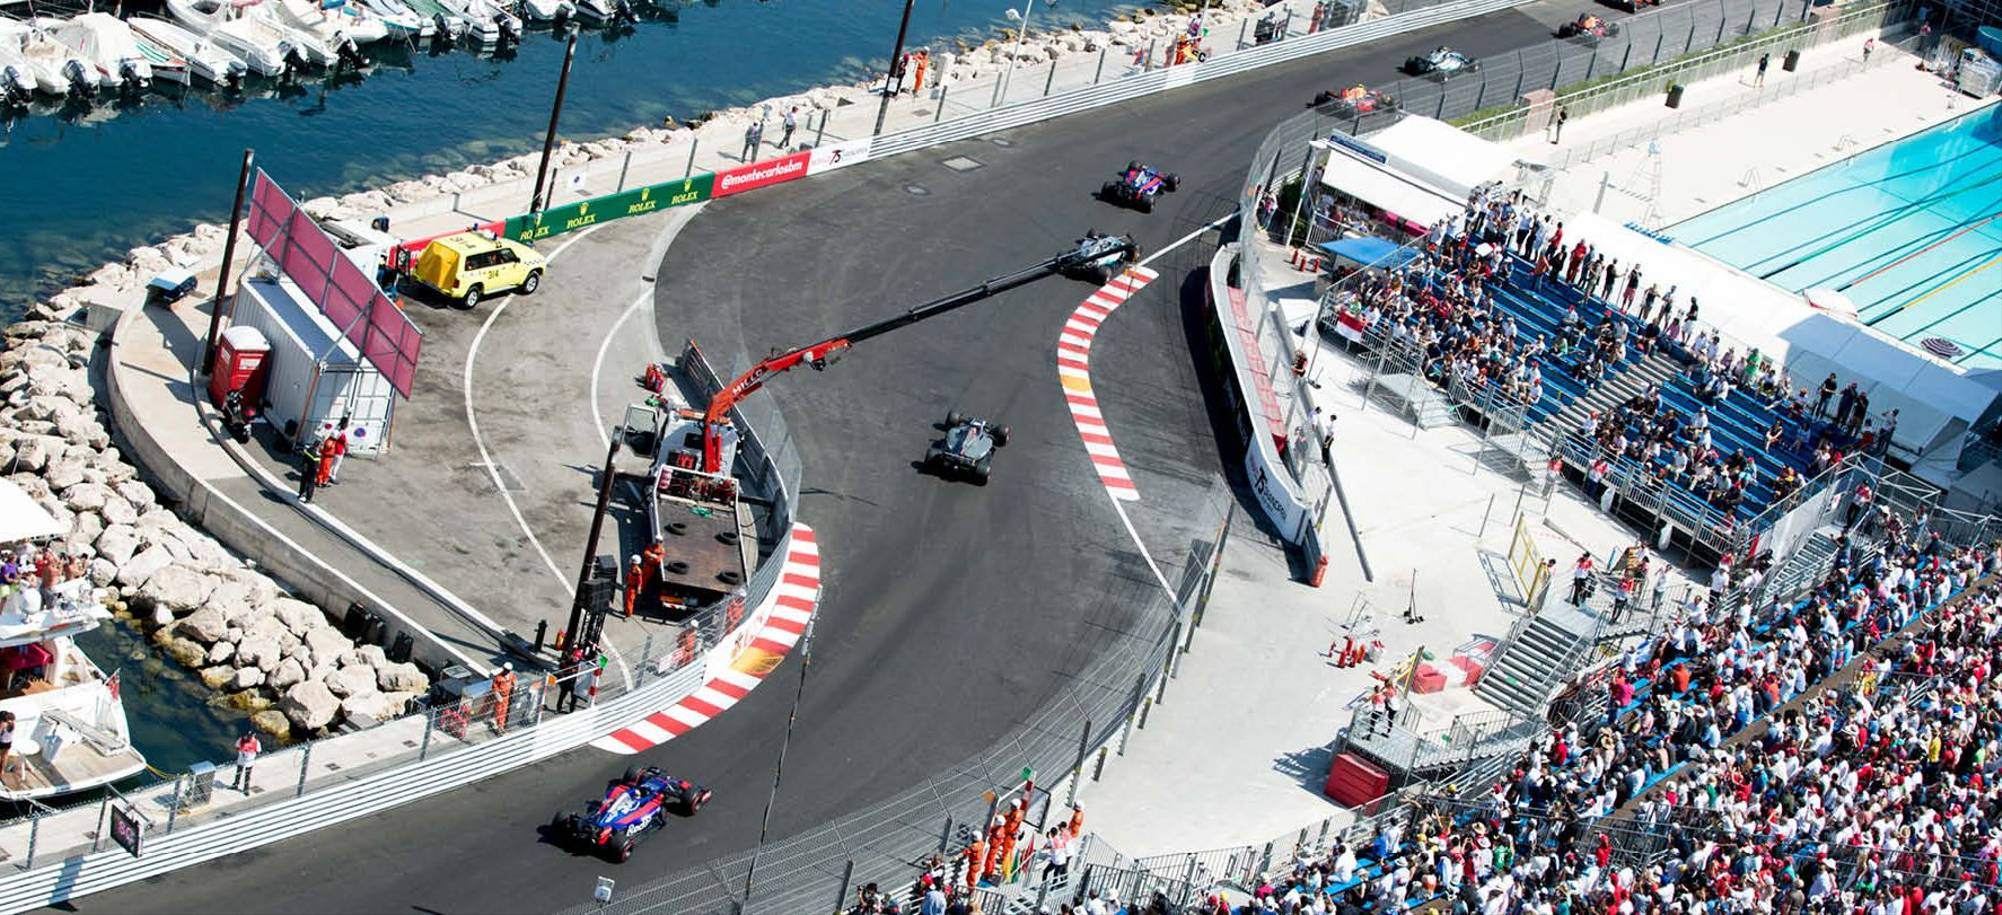 3 - Monaco Grand Prix Race Day.jpg